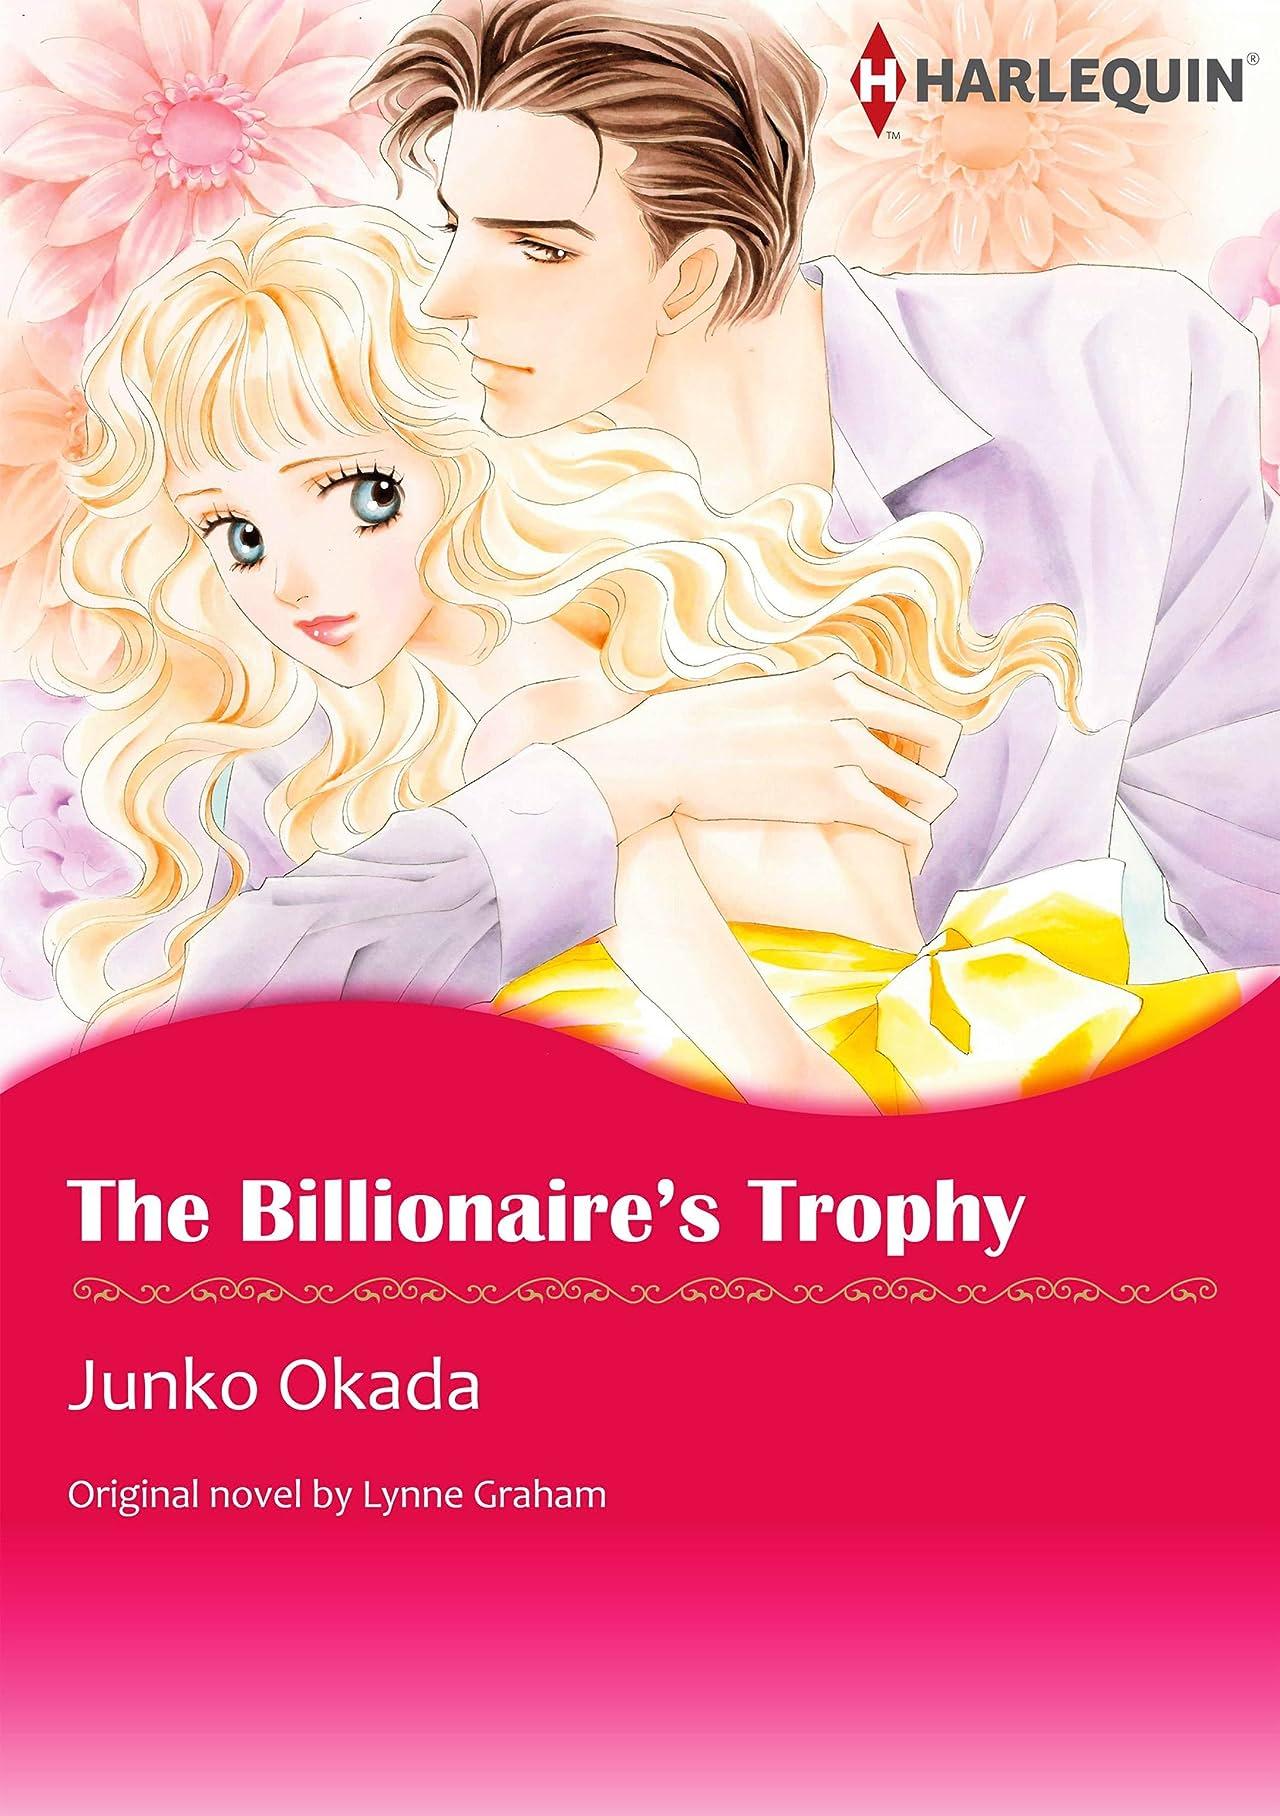 The Billionaire's Trophy Vol. 3: A Bride for a Billionaire III